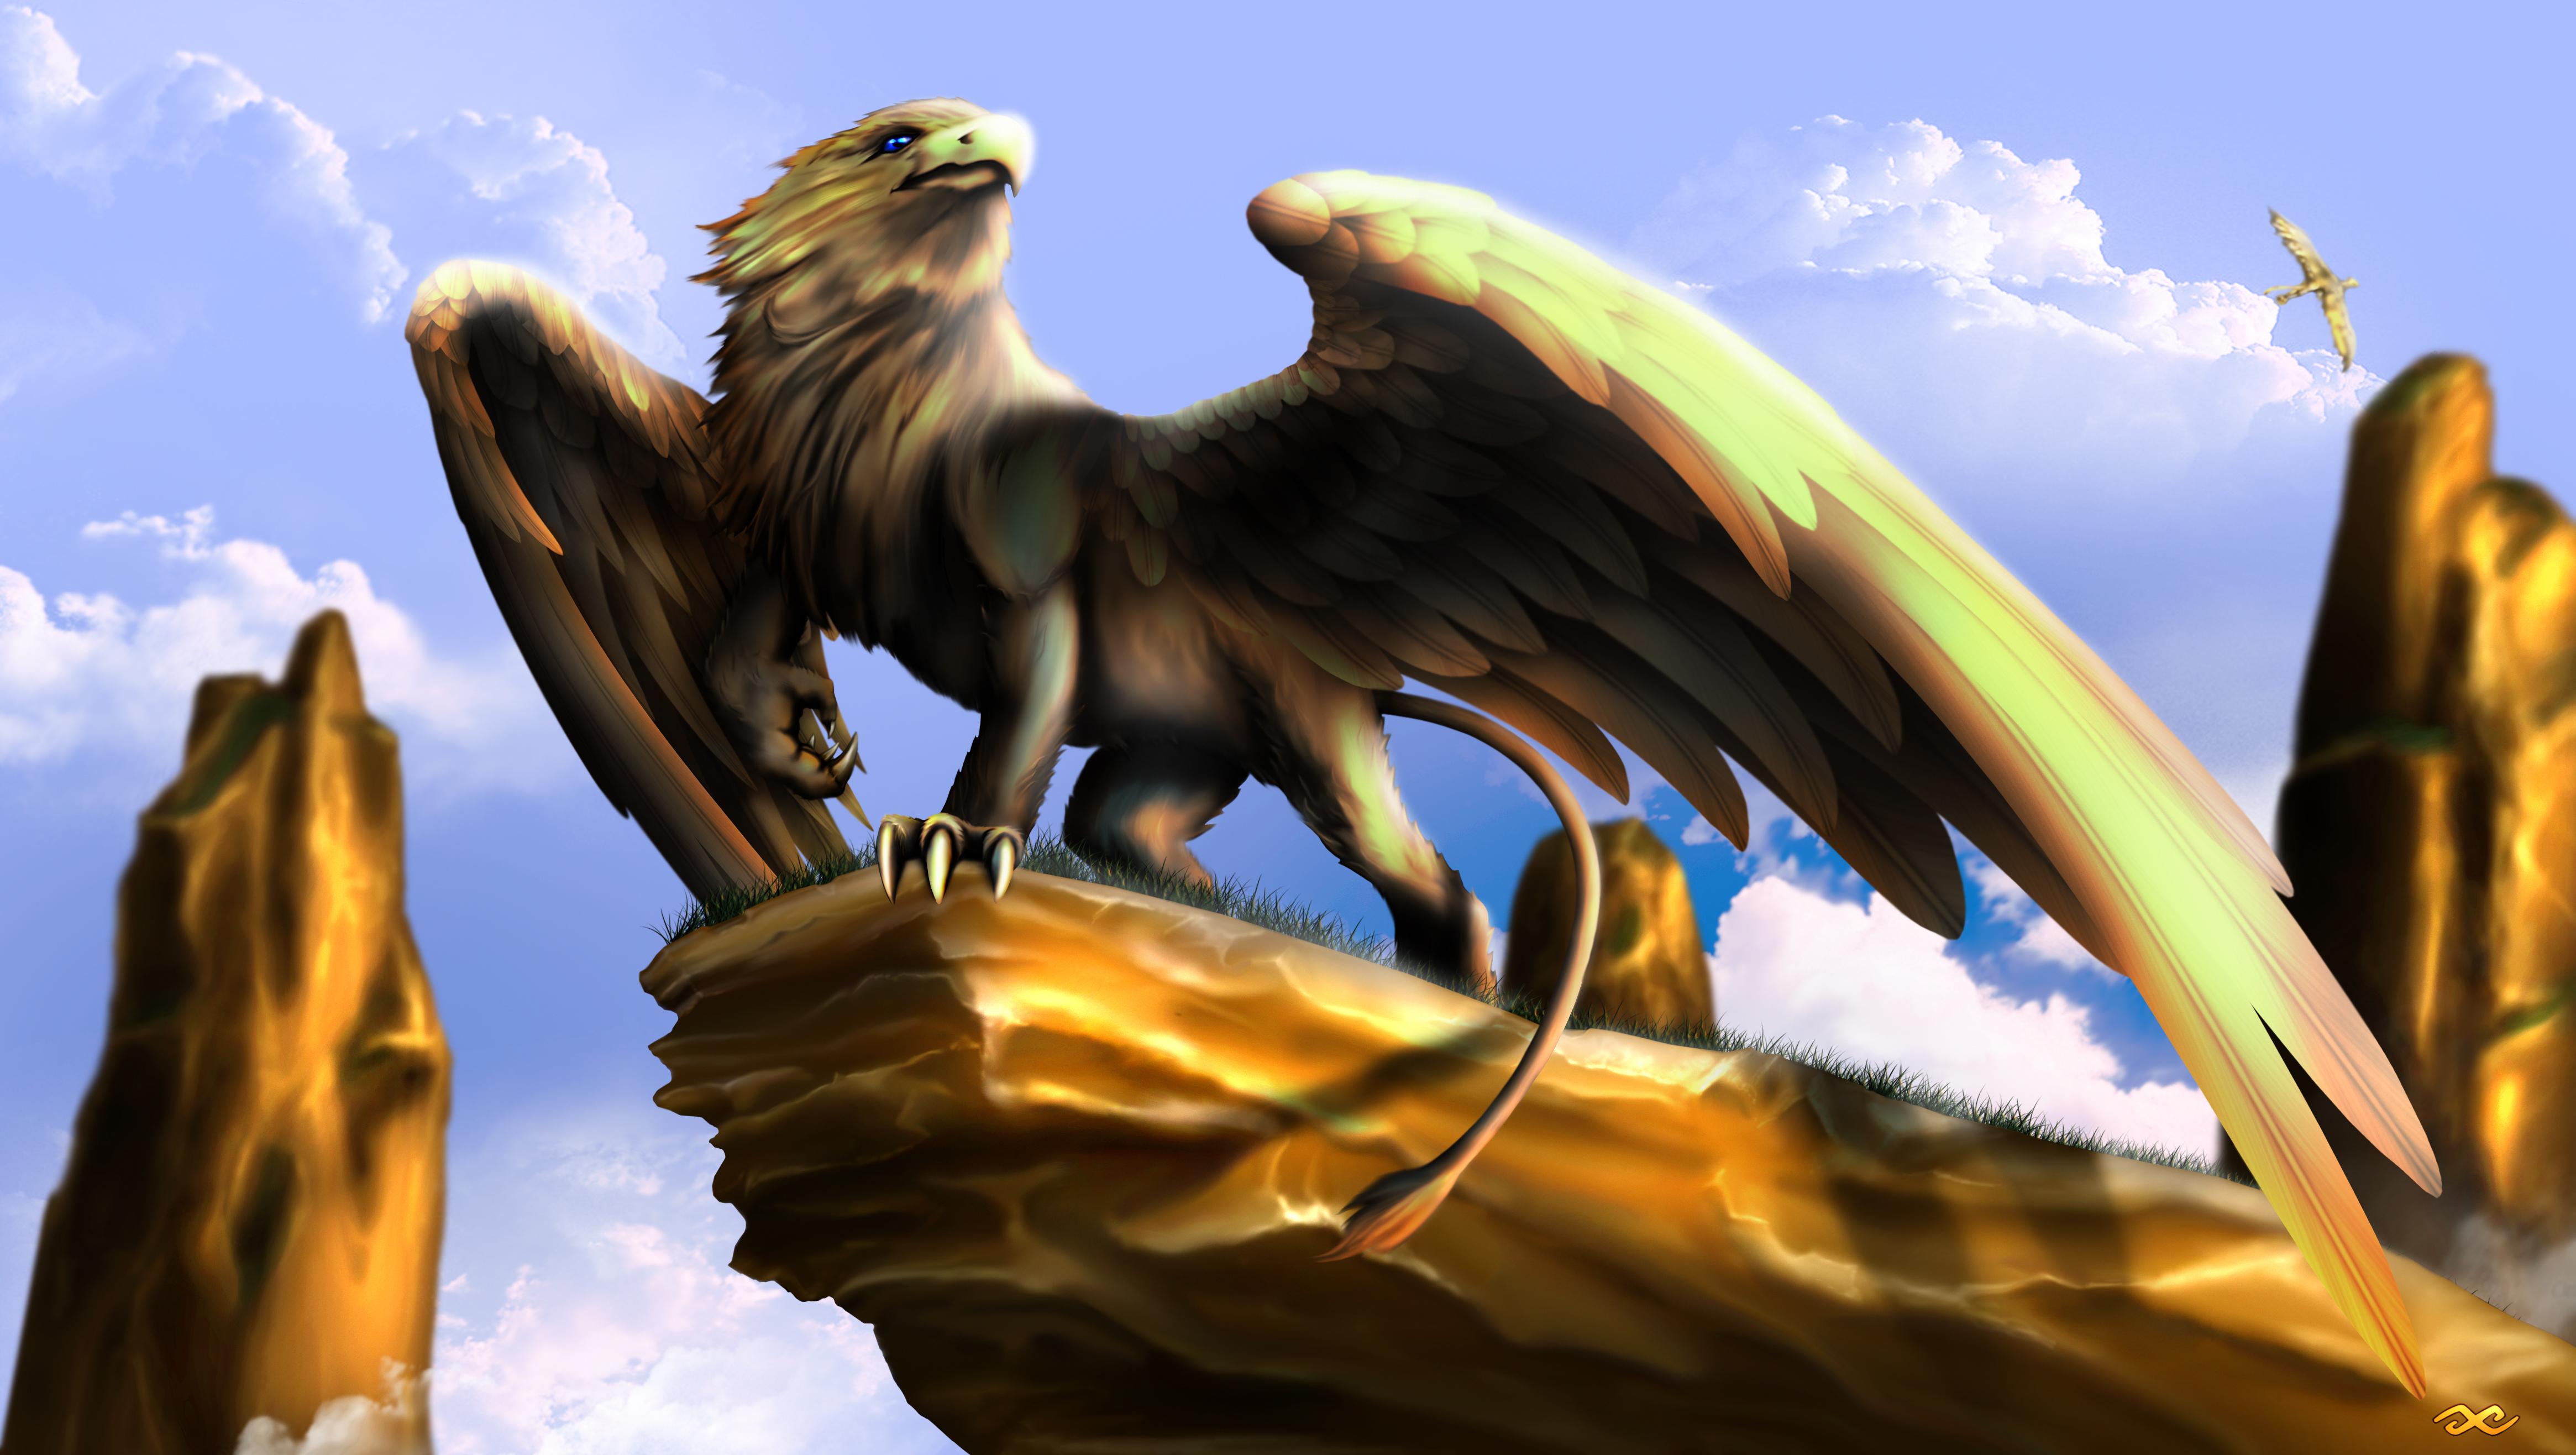 Griffin by guillaume phoenix on DeviantArt